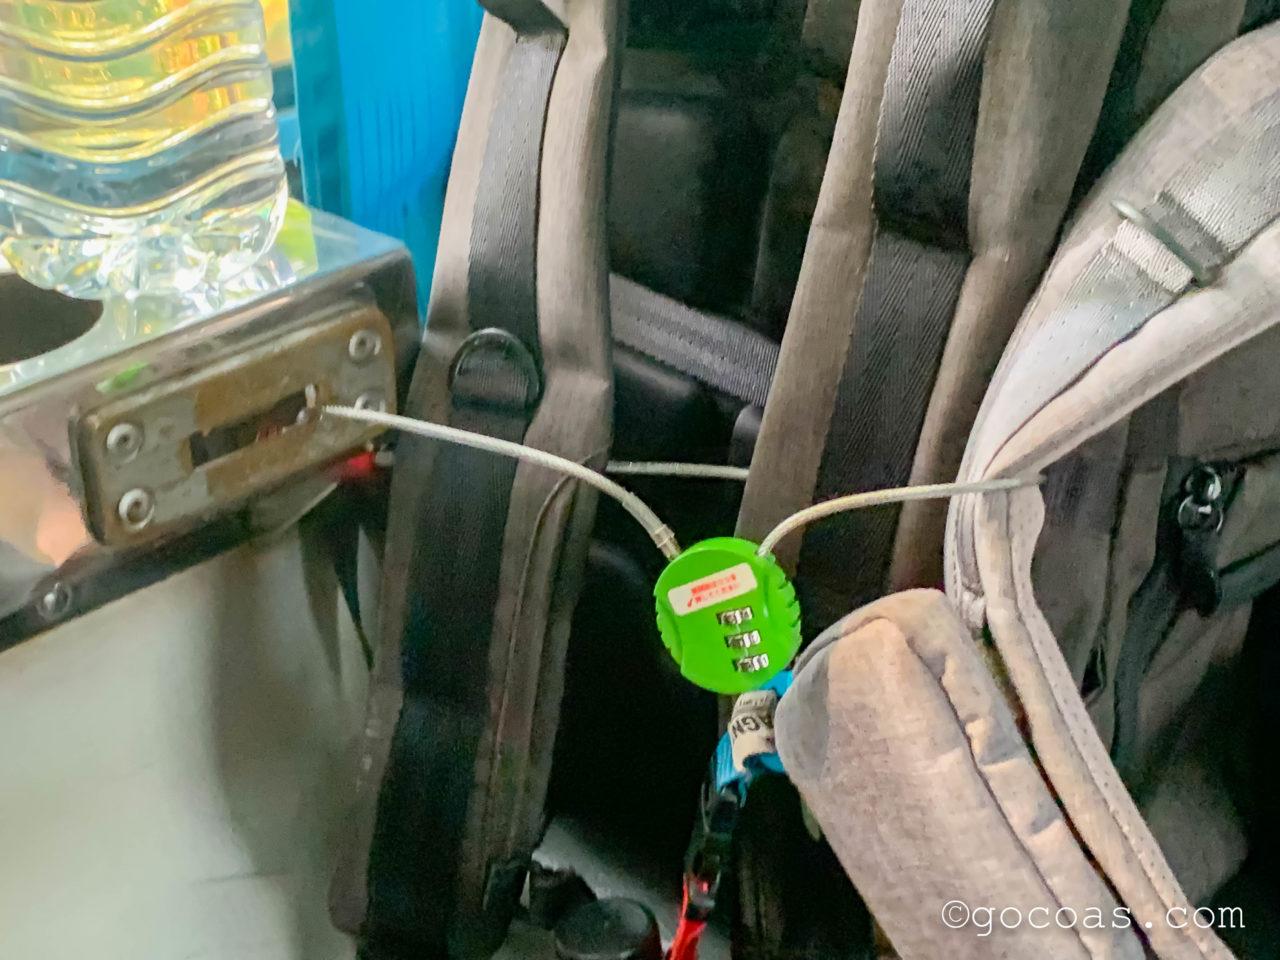 Hua Lamphong駅で乗った電車内でかばんを鍵で固定したところ